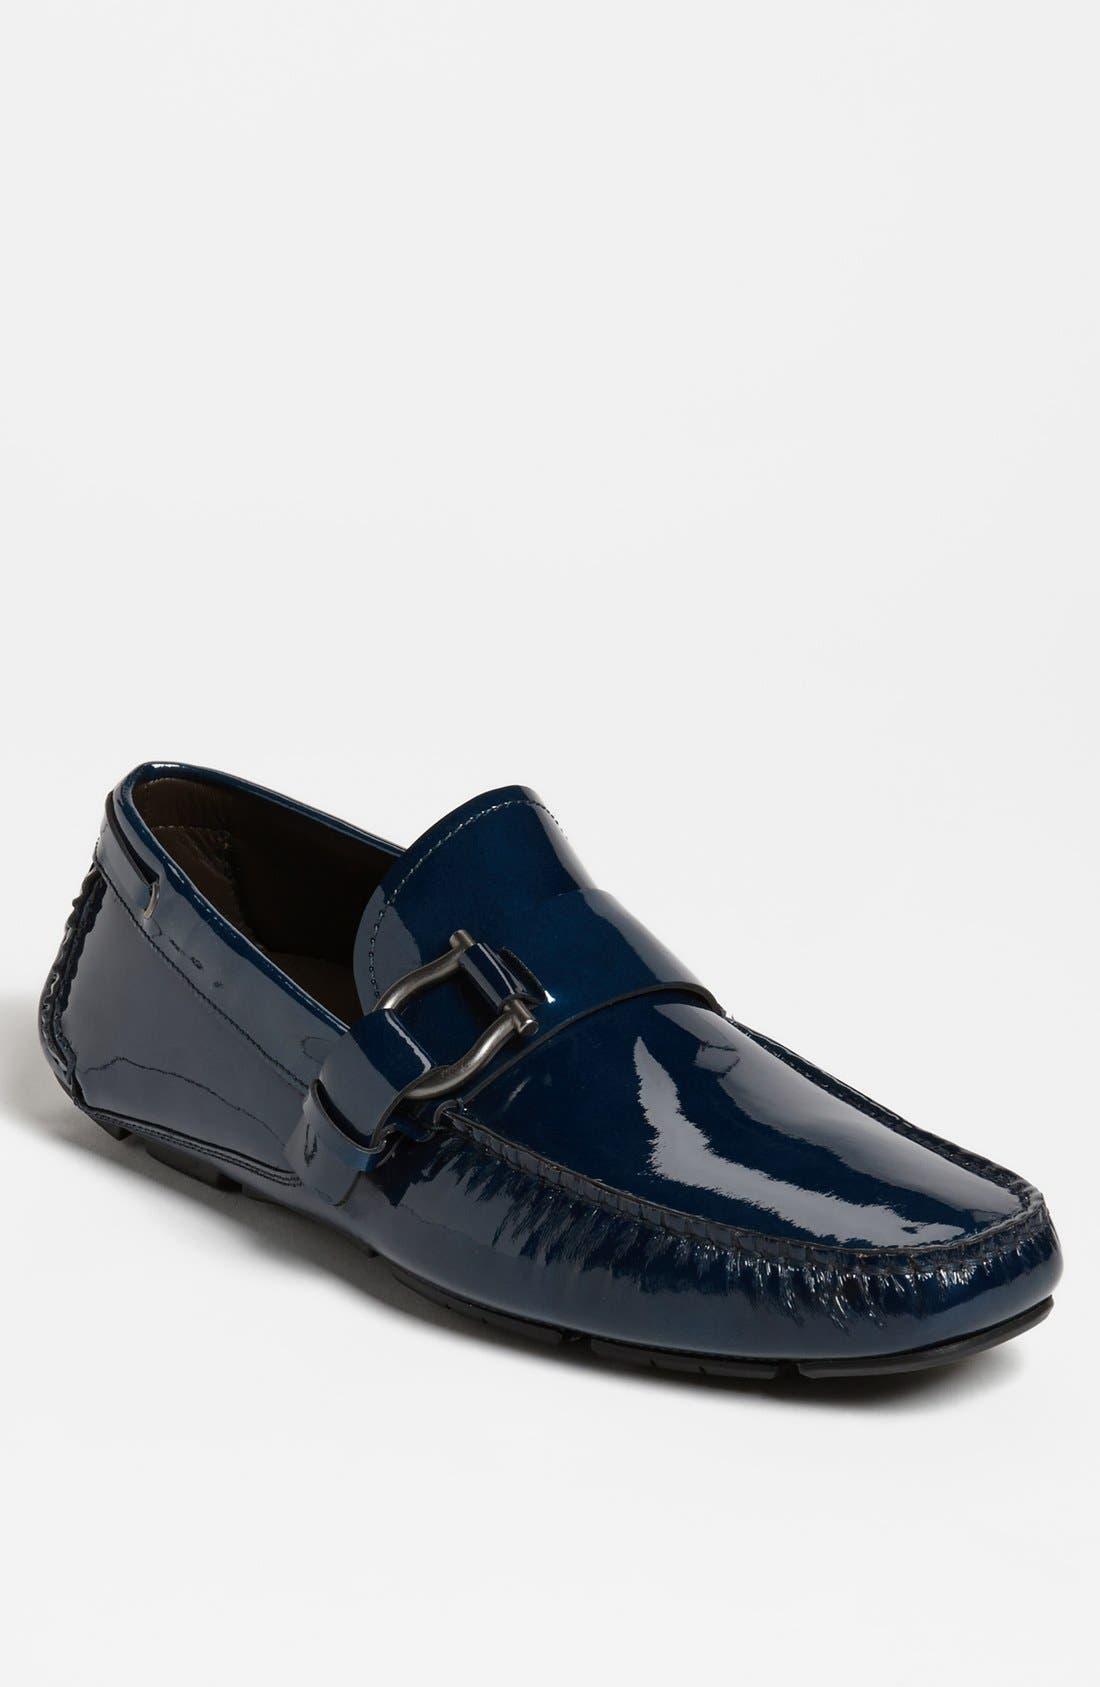 Alternate Image 1 Selected - Salvatore Ferragamo 'Cabo' Driving Shoe